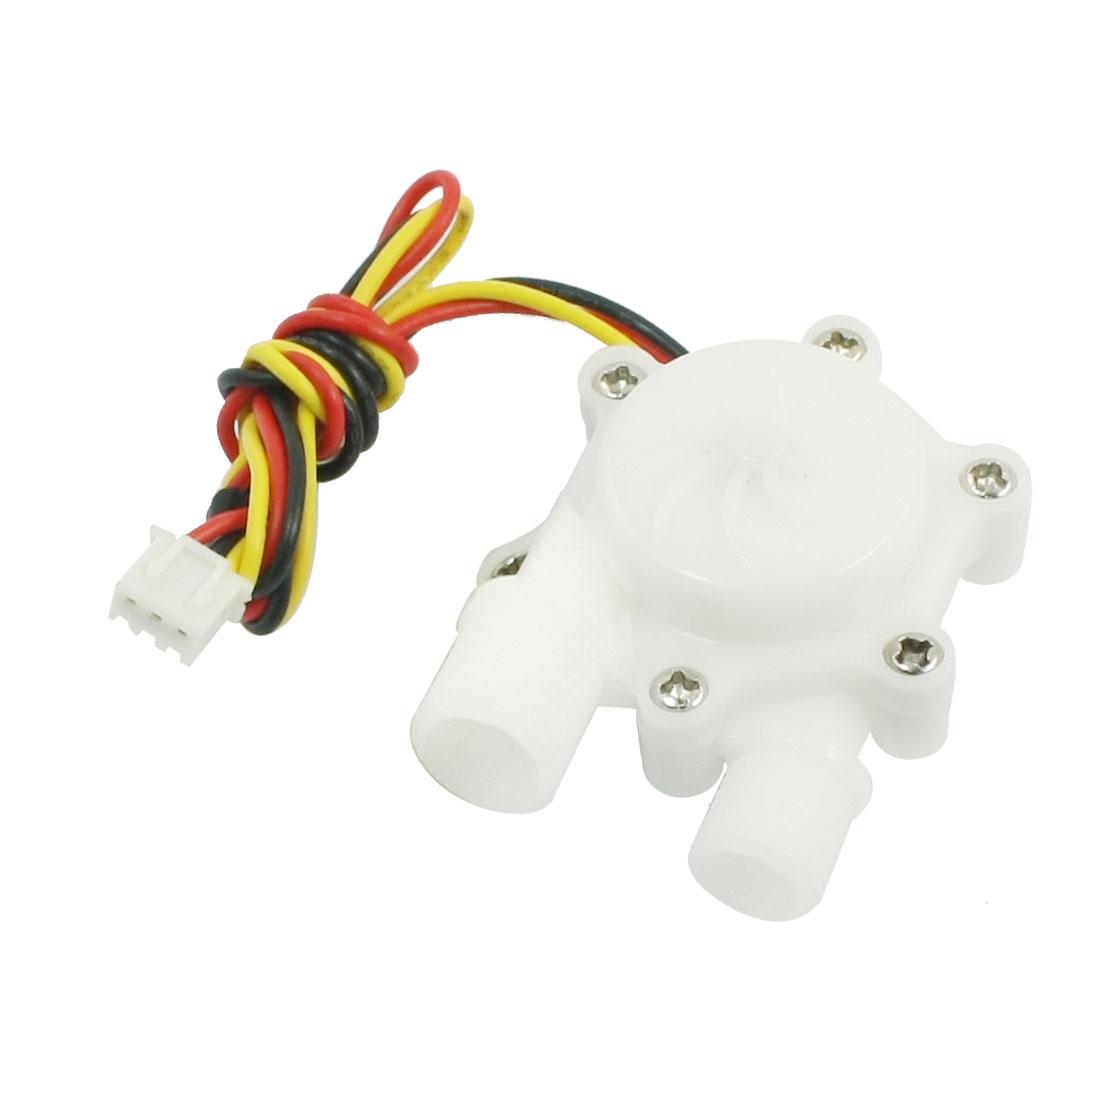 SEN-HW06W G1/4 Inlet Outlet Water Flow Sensor 0.25-3.5L/min 0.8Mpa